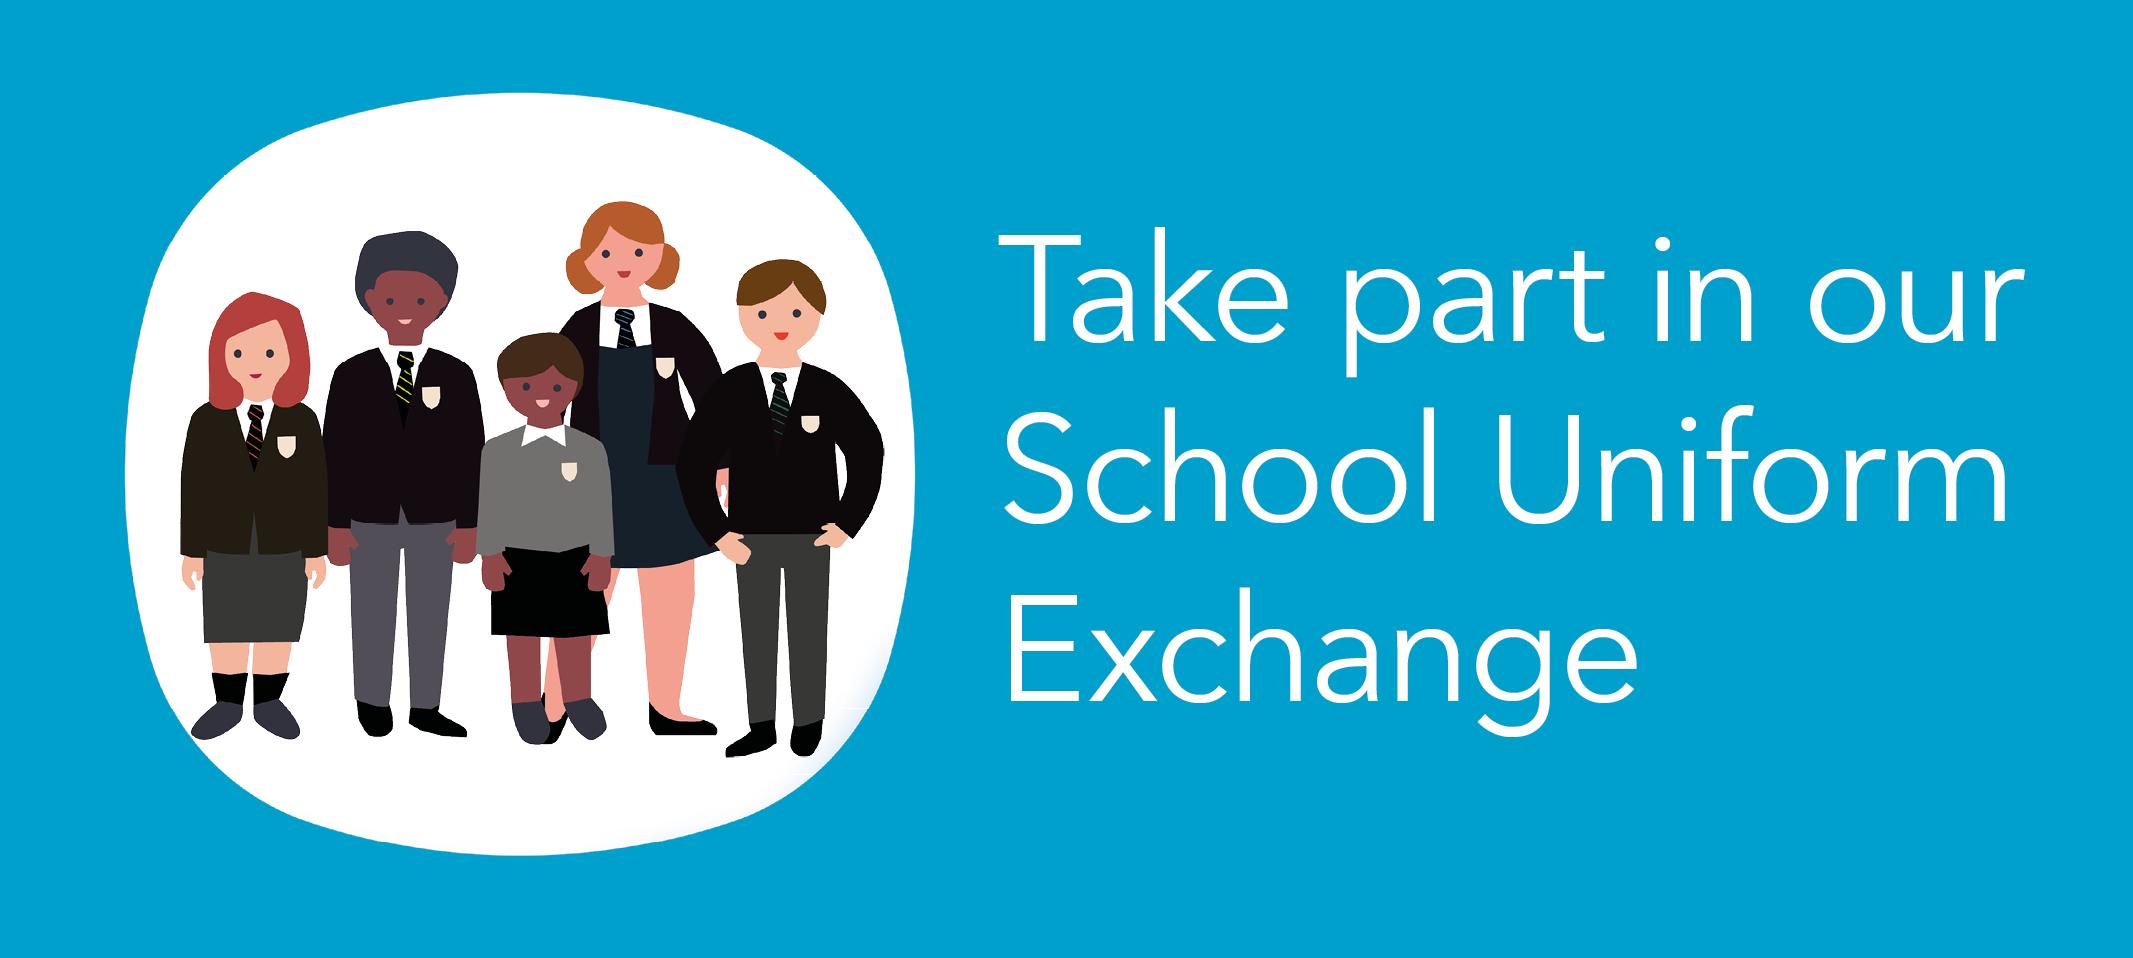 Our new School Uniform Exchange